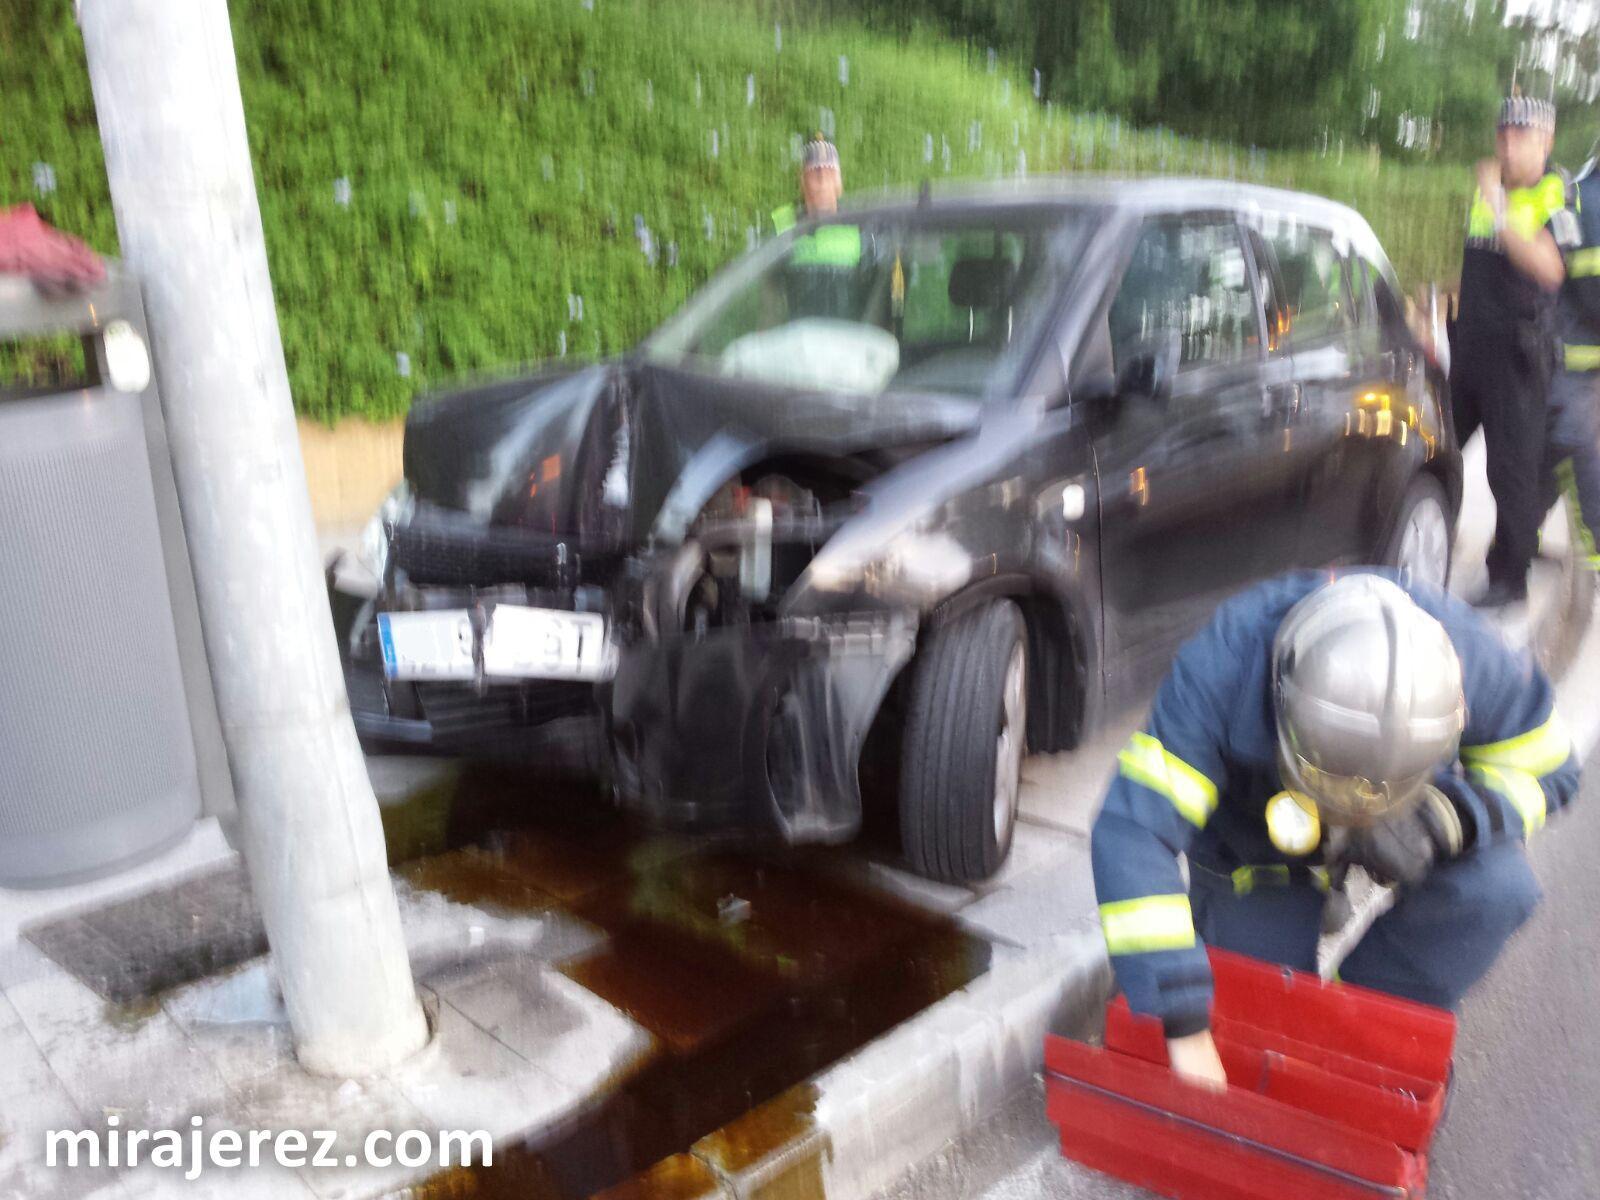 accidente Jerez 16 ago 2016 a